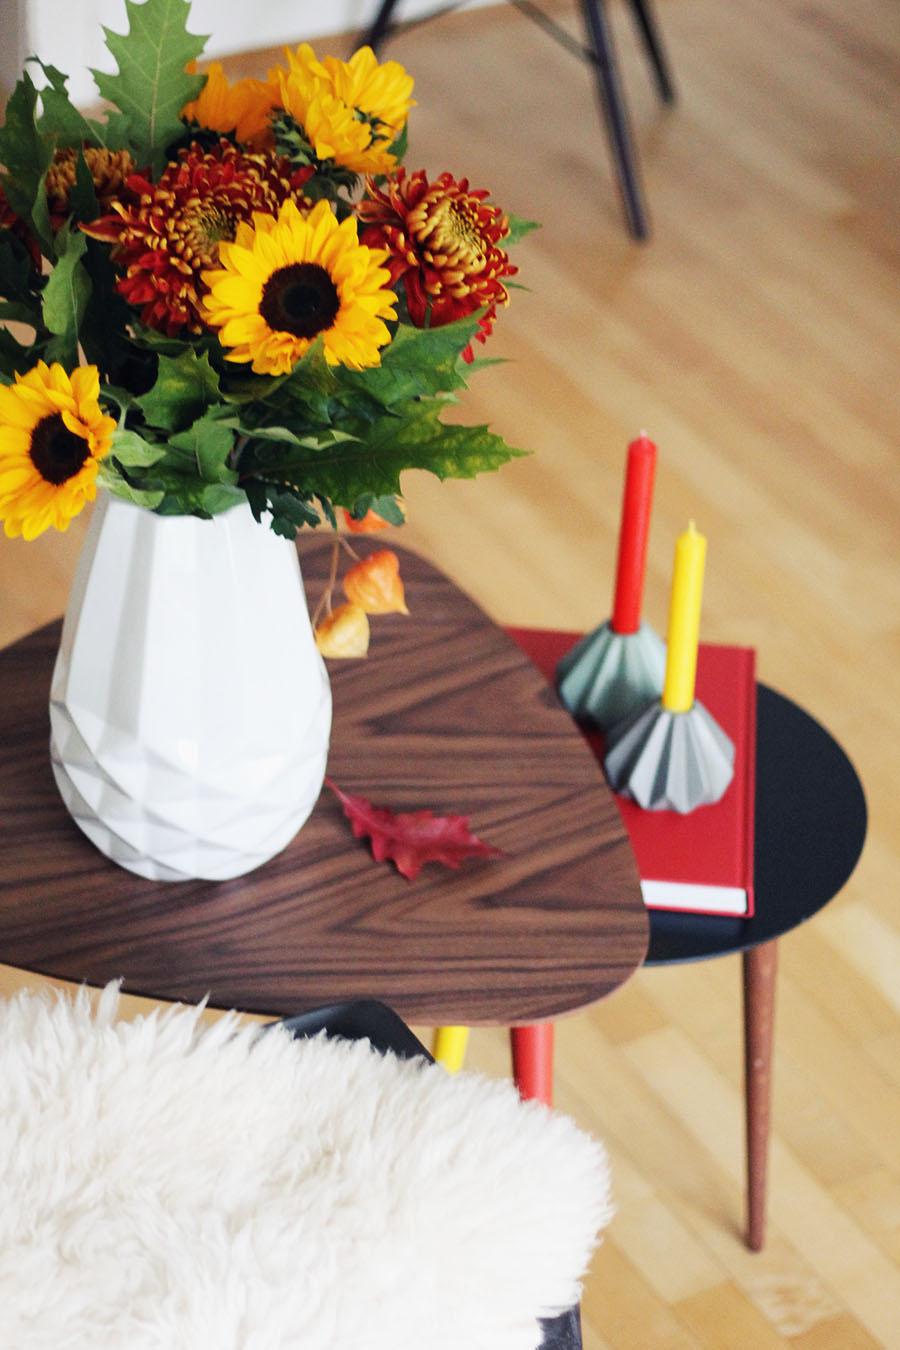 nicetohavemag-mycs-interiorblogger-coffeetable-interiordesign-germandesign-sonnenblumen-herbstdeko